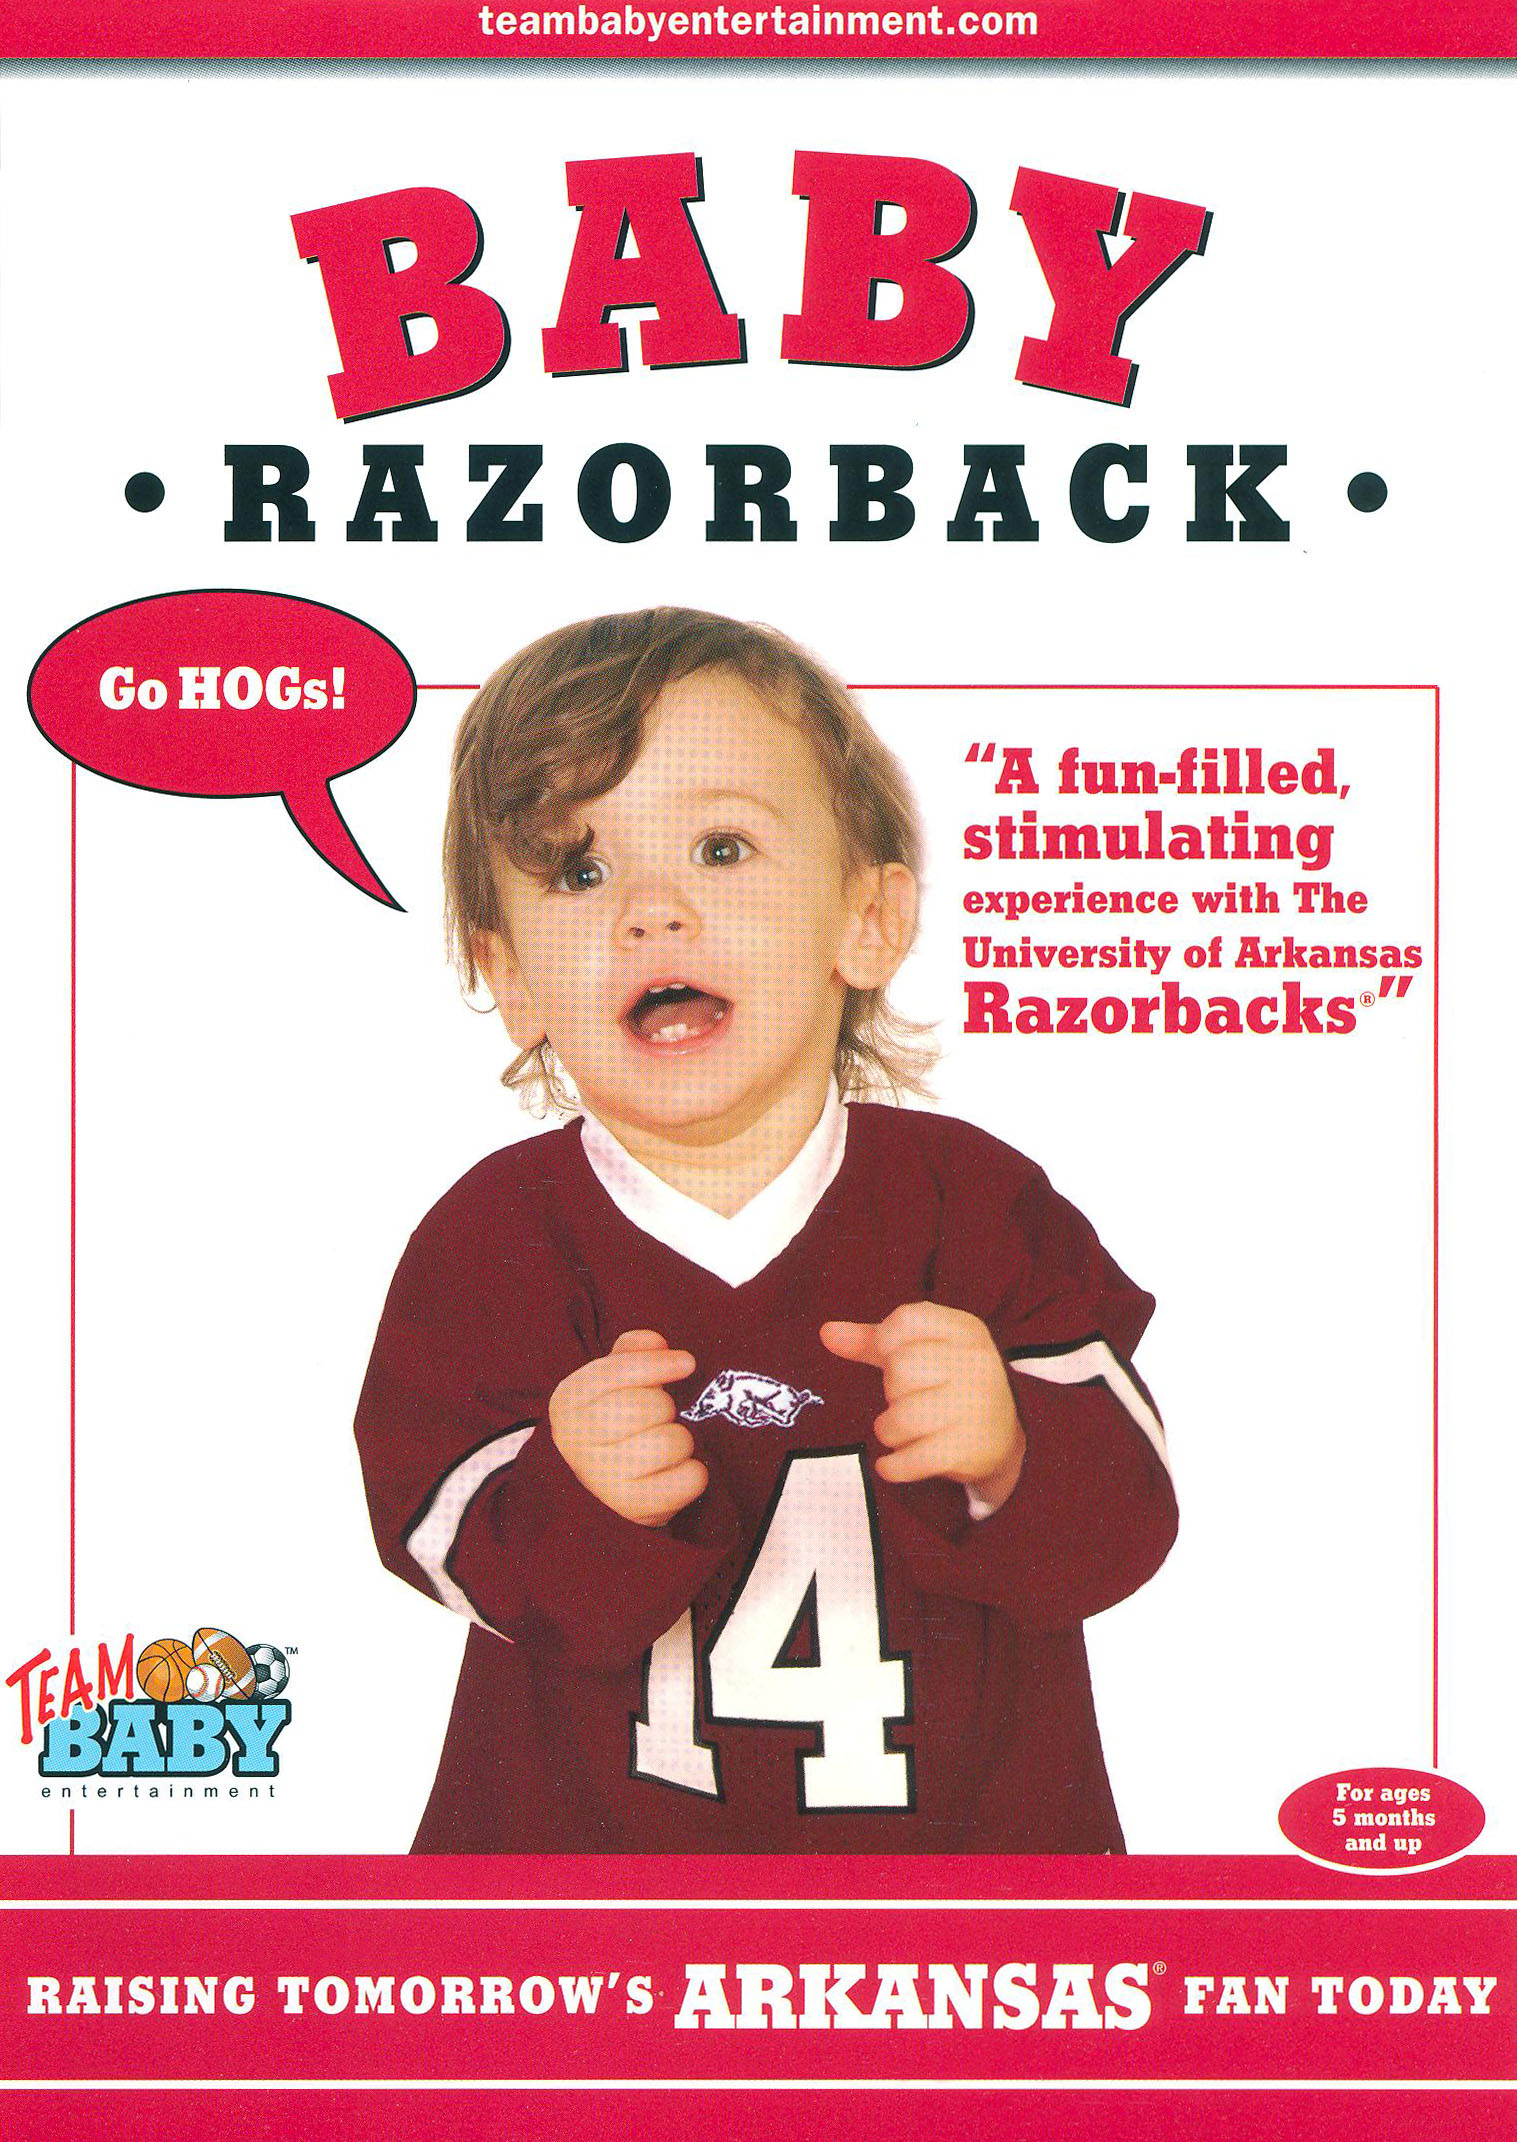 Team Baby: Baby Razorback